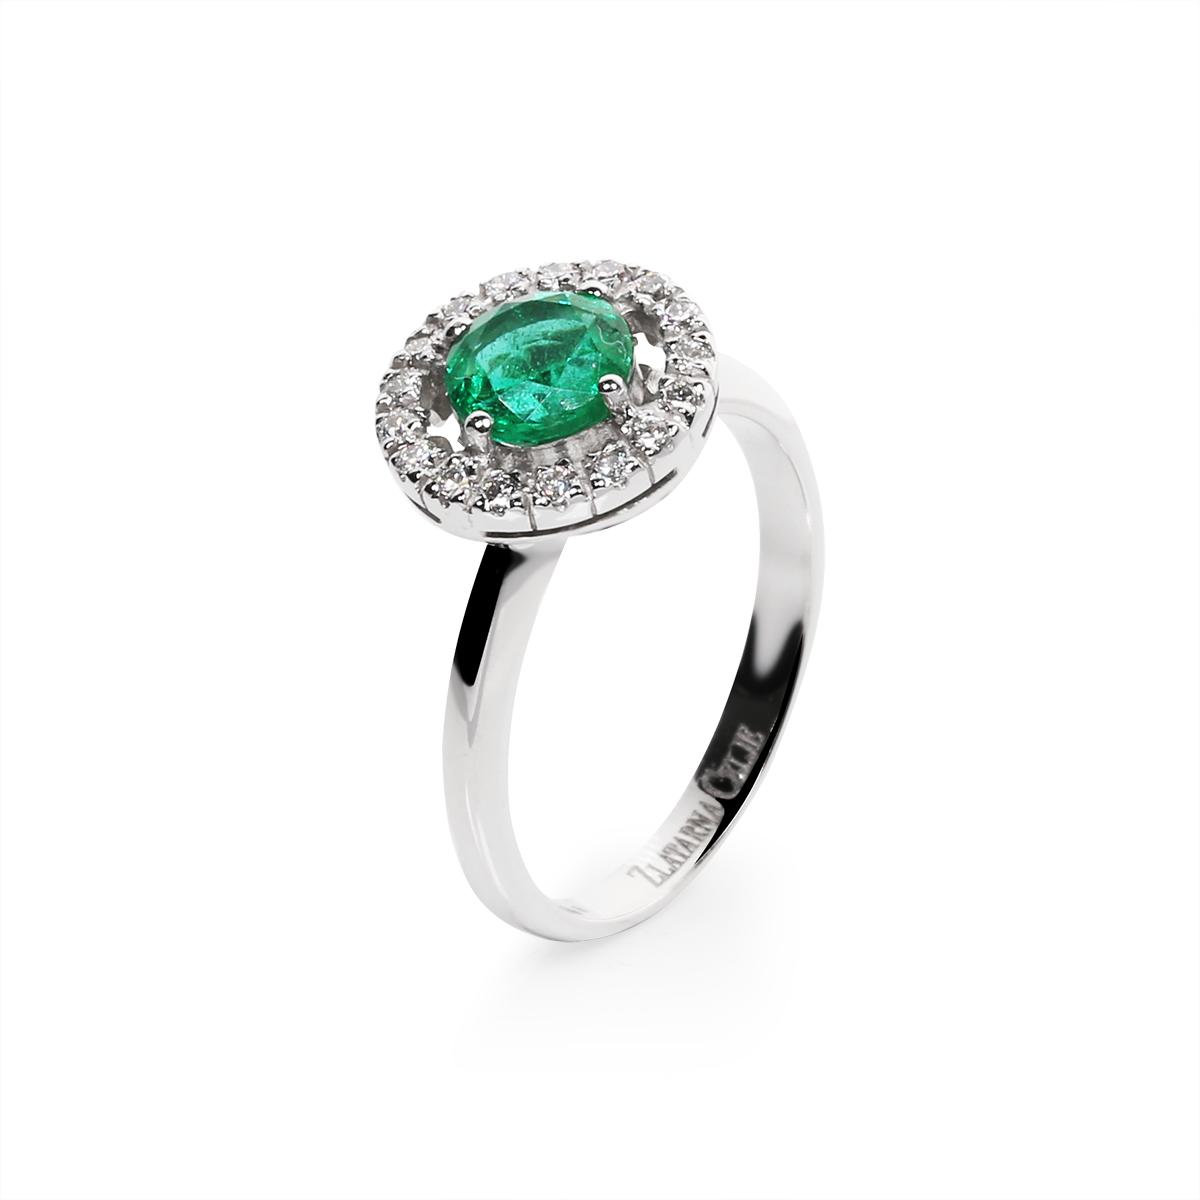 diamond 0,01 ct - 17 x; emerald fi 6 mm - 1 x